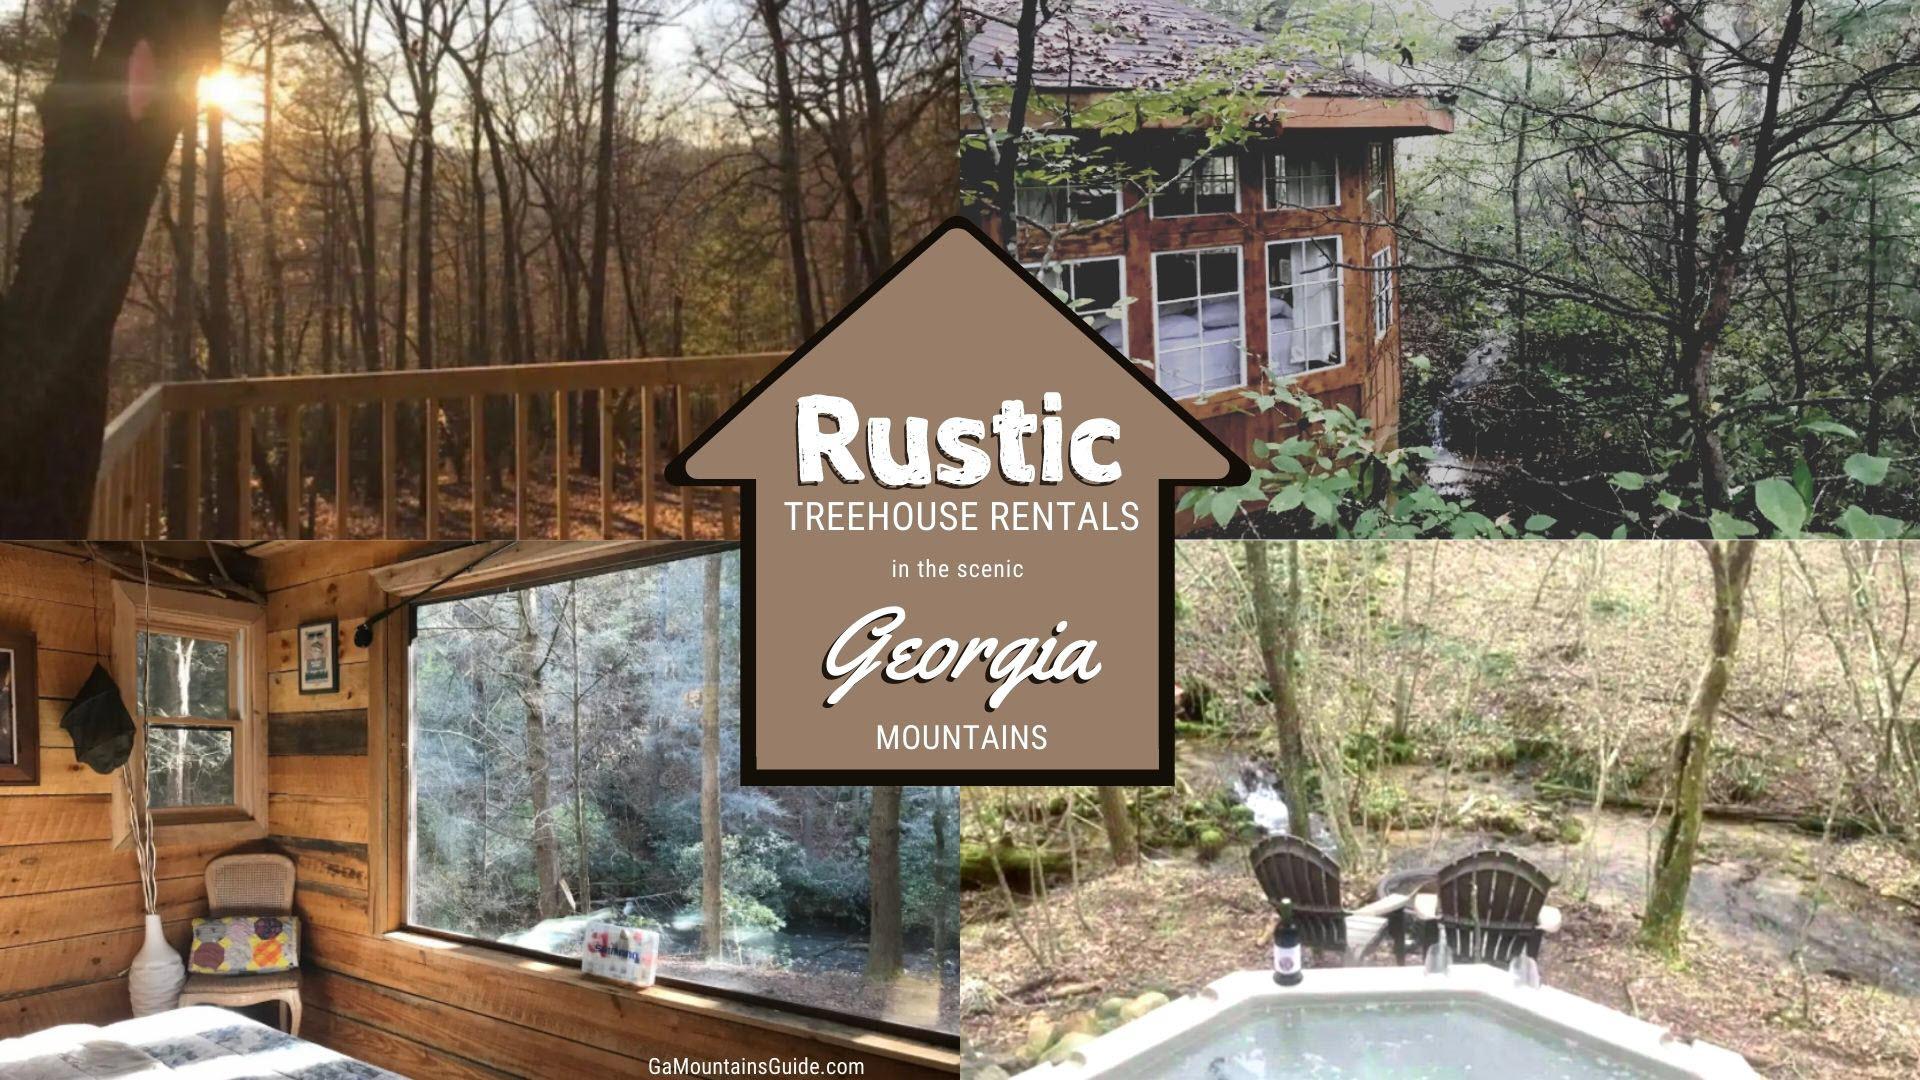 Rustic-Treehouse-Rentals-Georgia-Mountains-FB